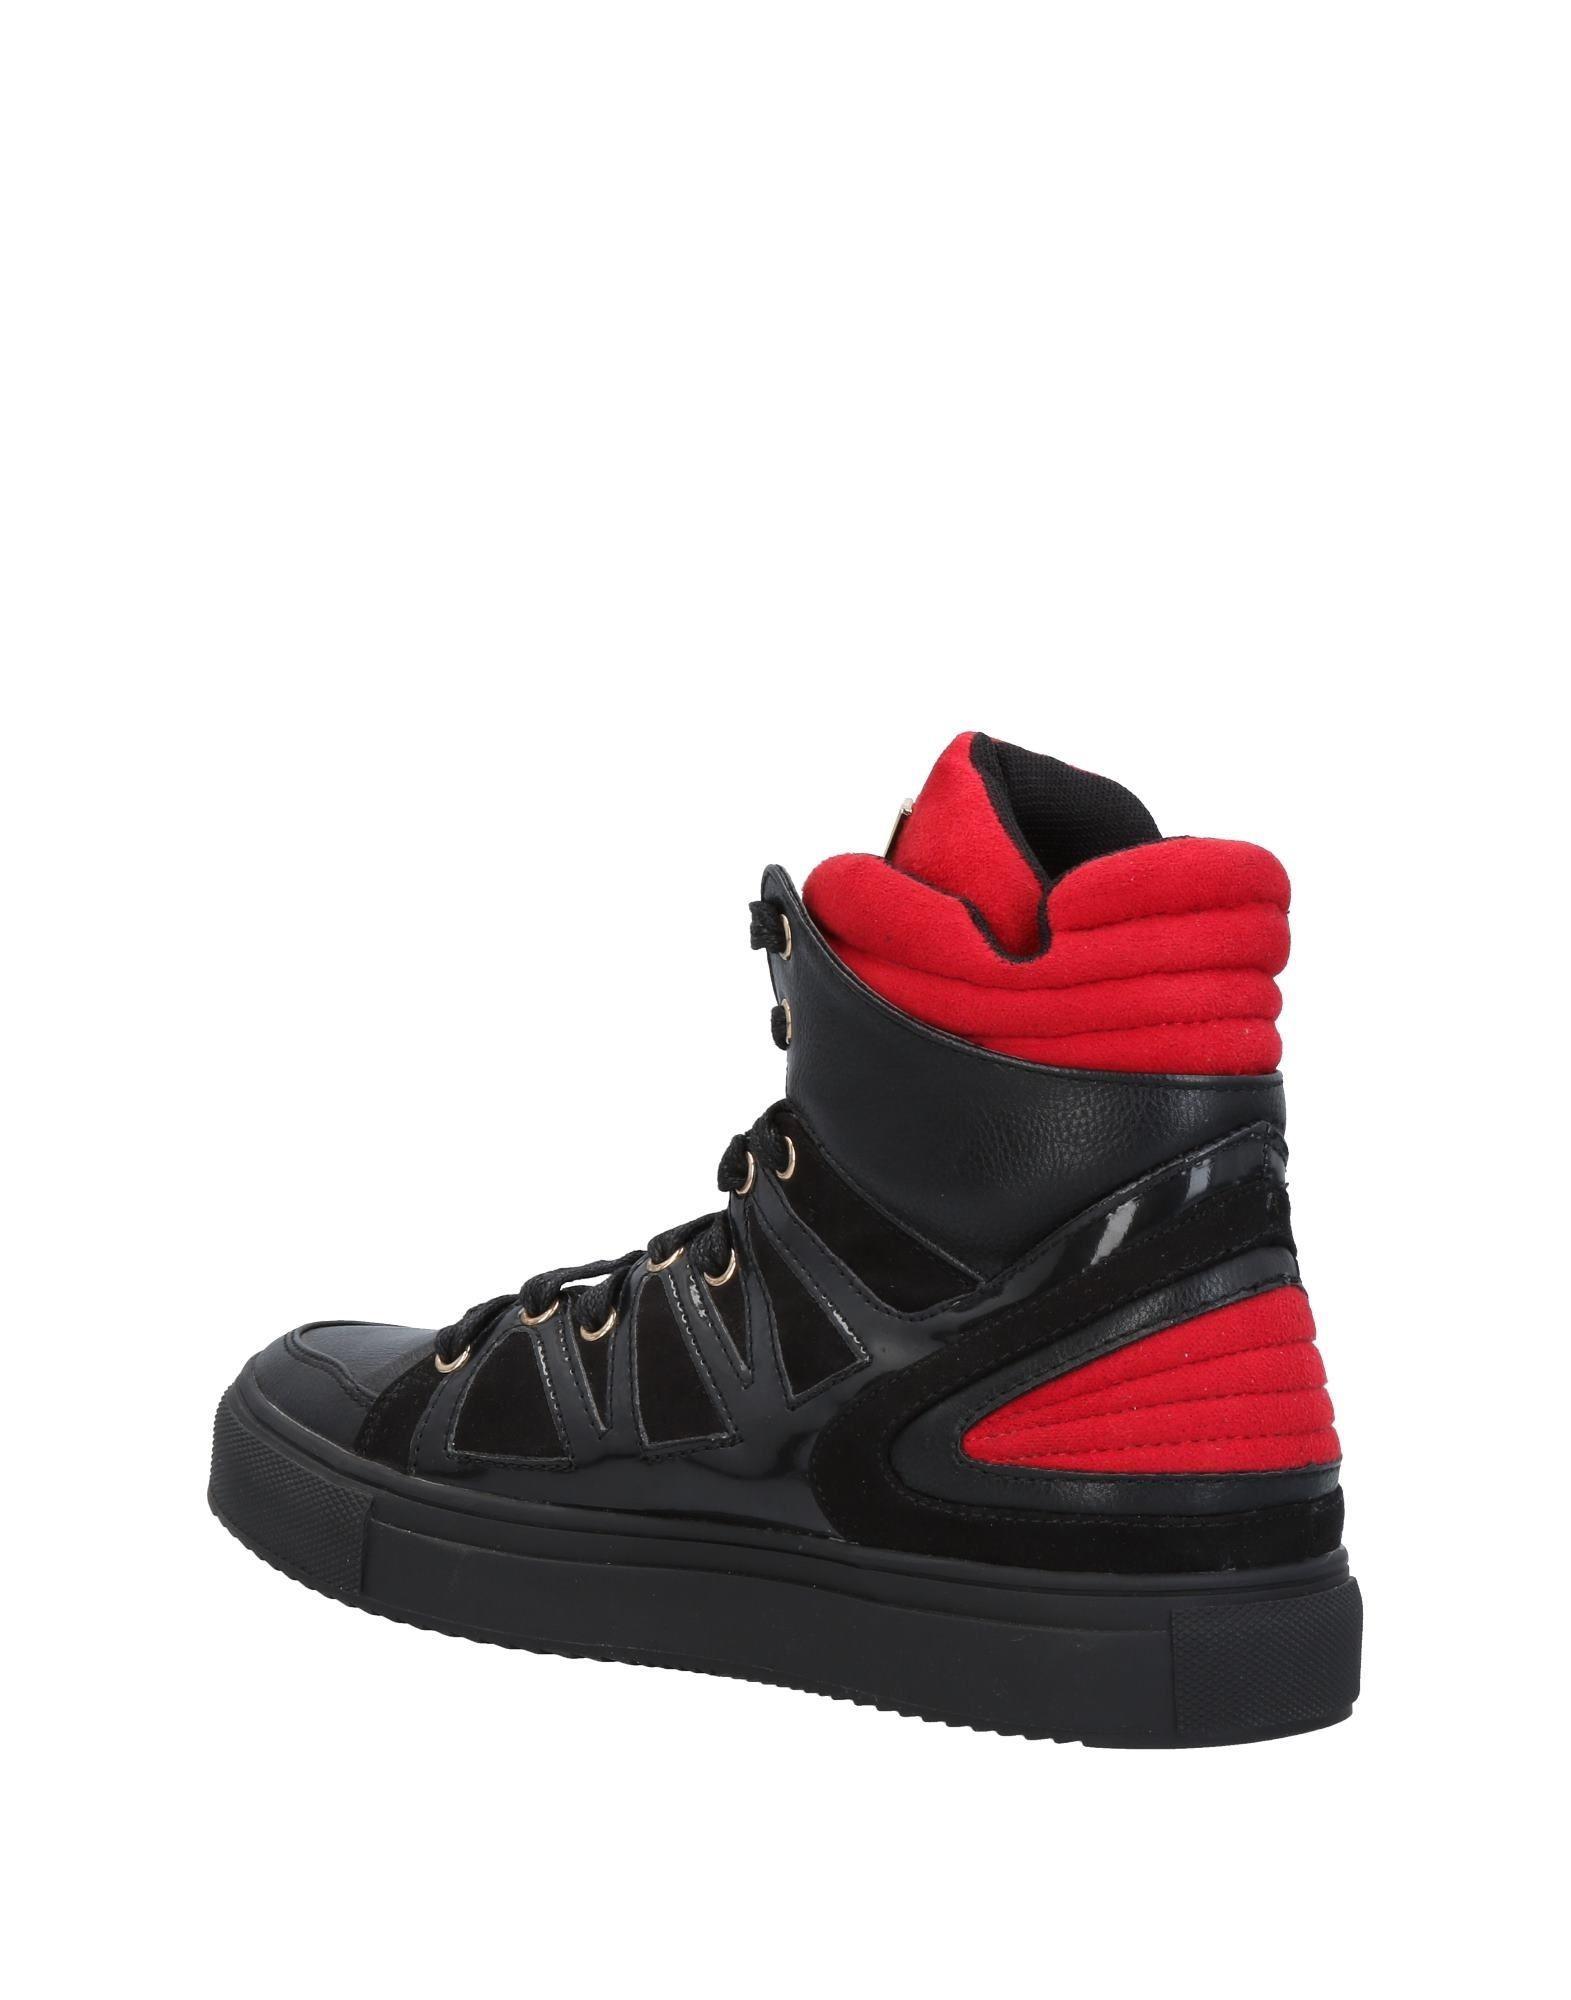 designer fashion c0779 3d858 roccobarocco-Black-High-tops-Sneakers.jpeg